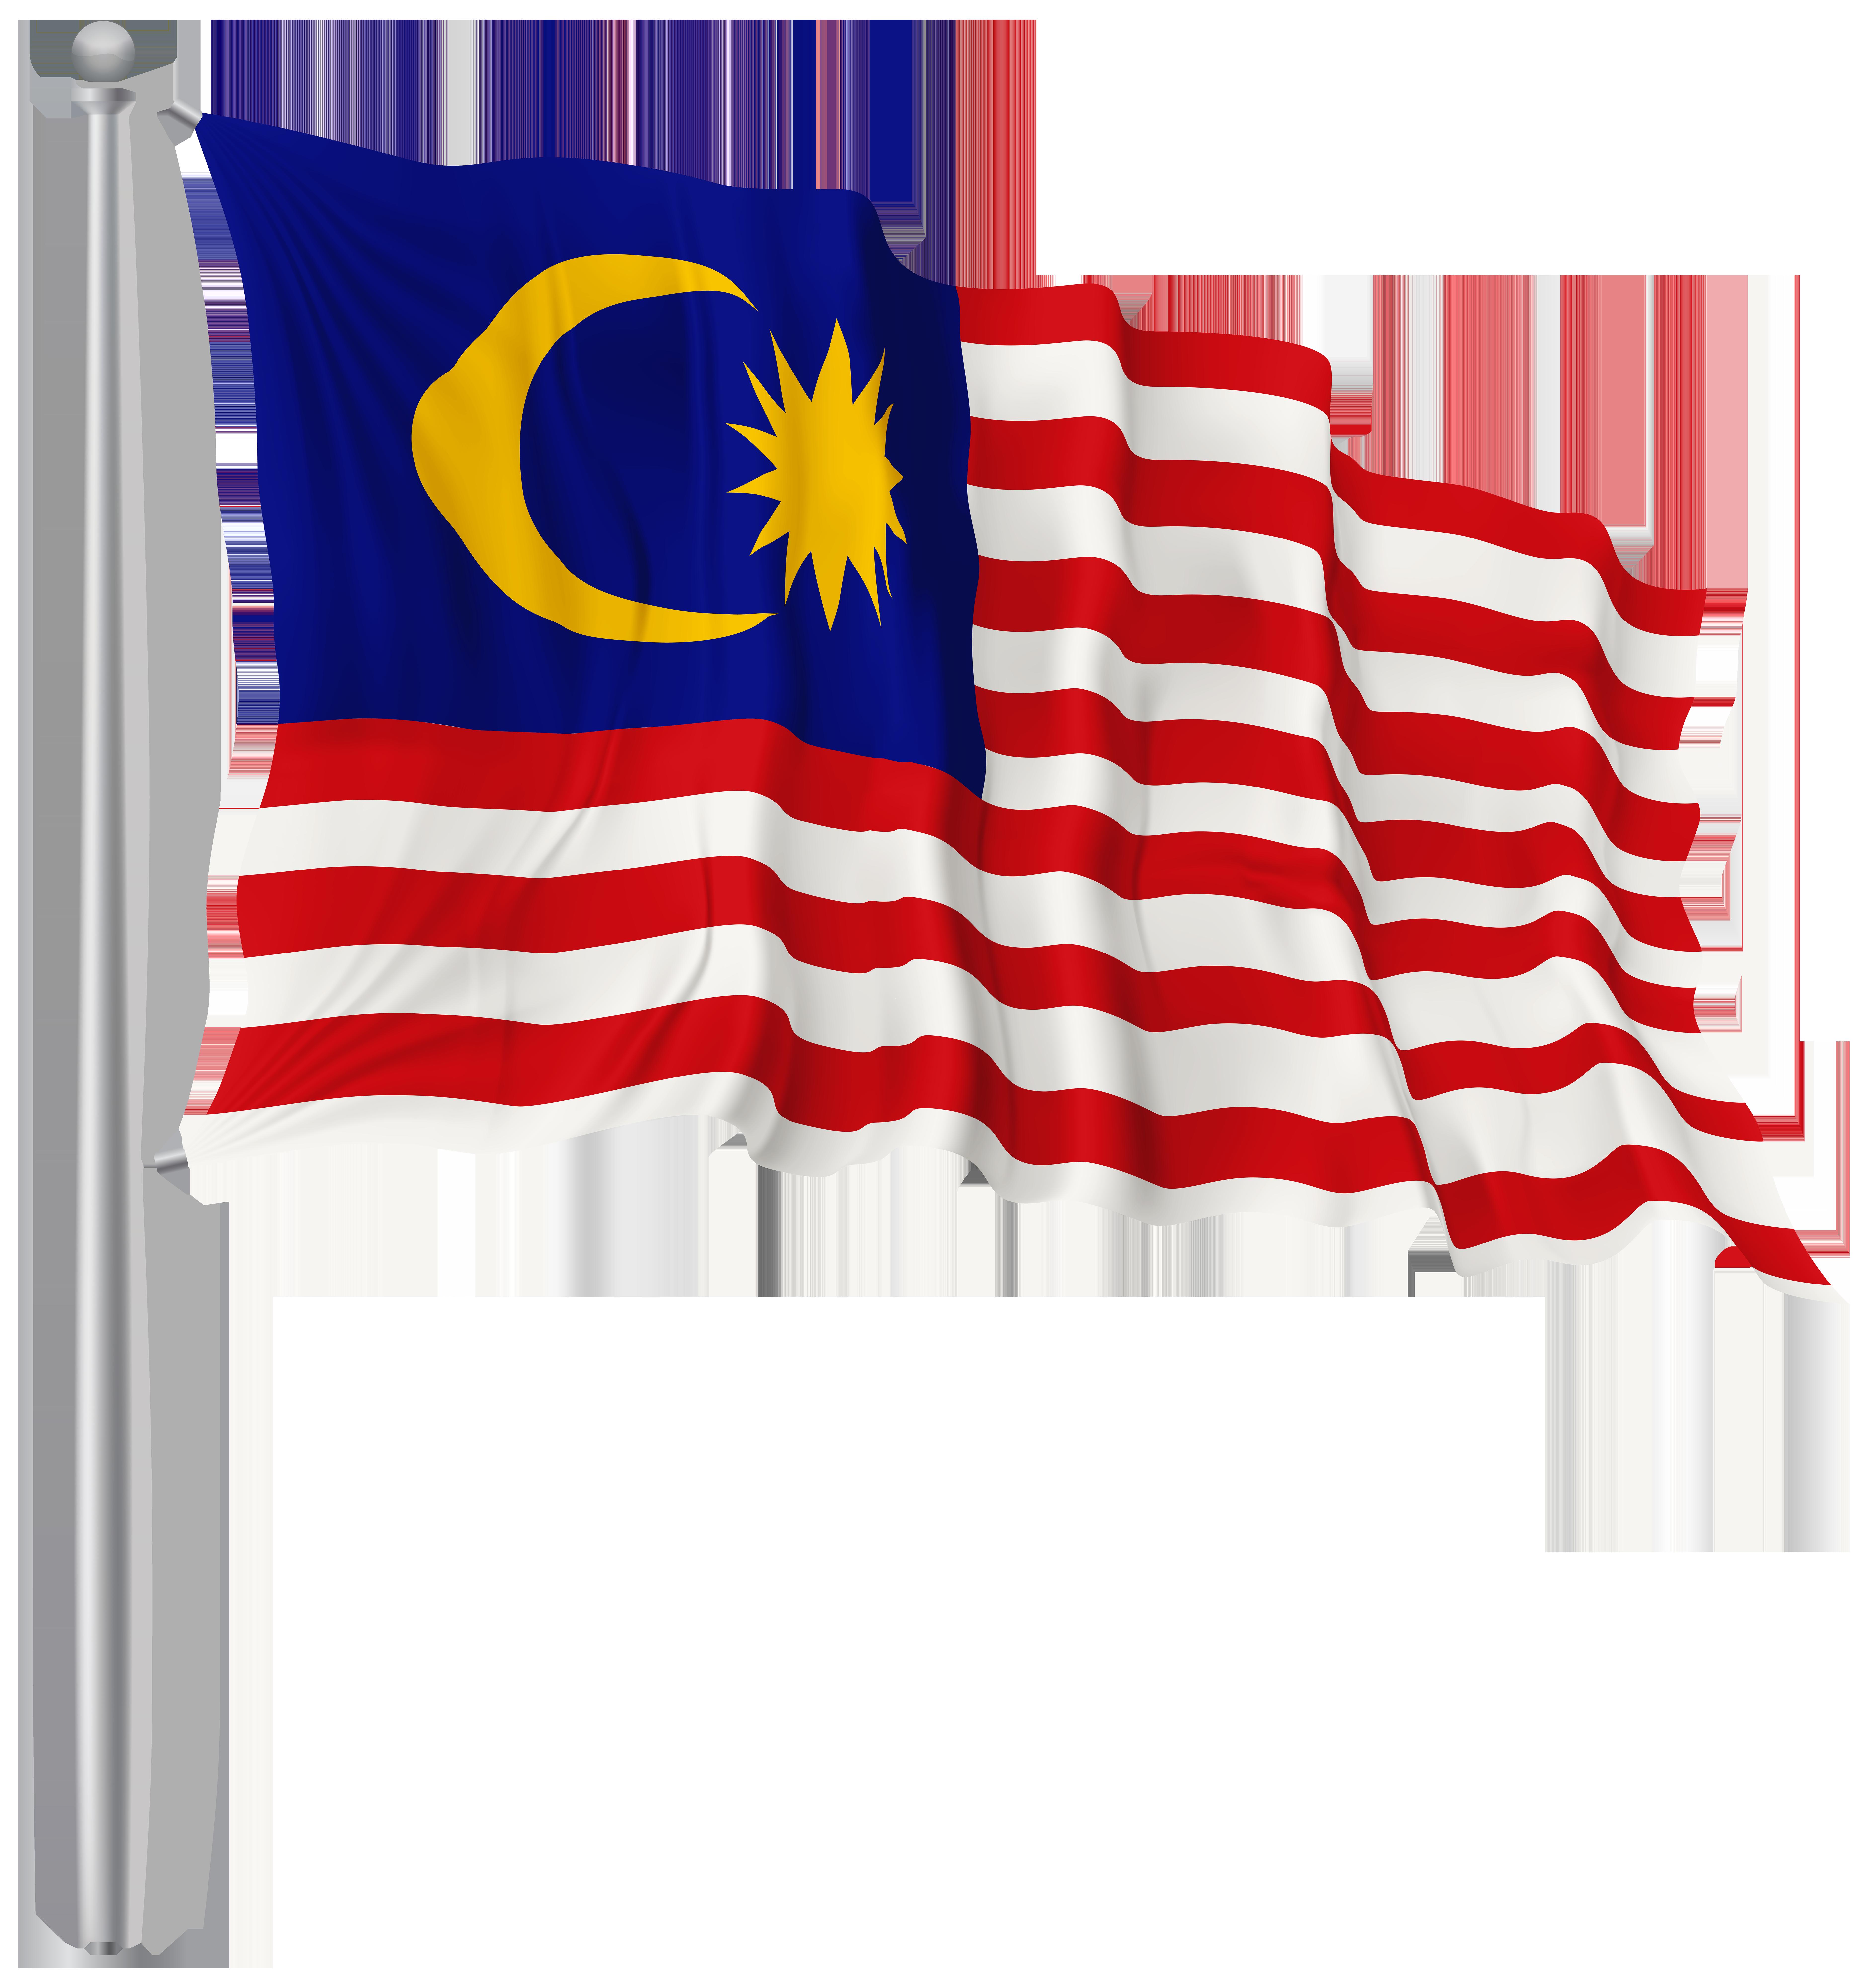 7517x8000 Malaysia Waving Flag Png Imageu200b Gallery Yopriceville